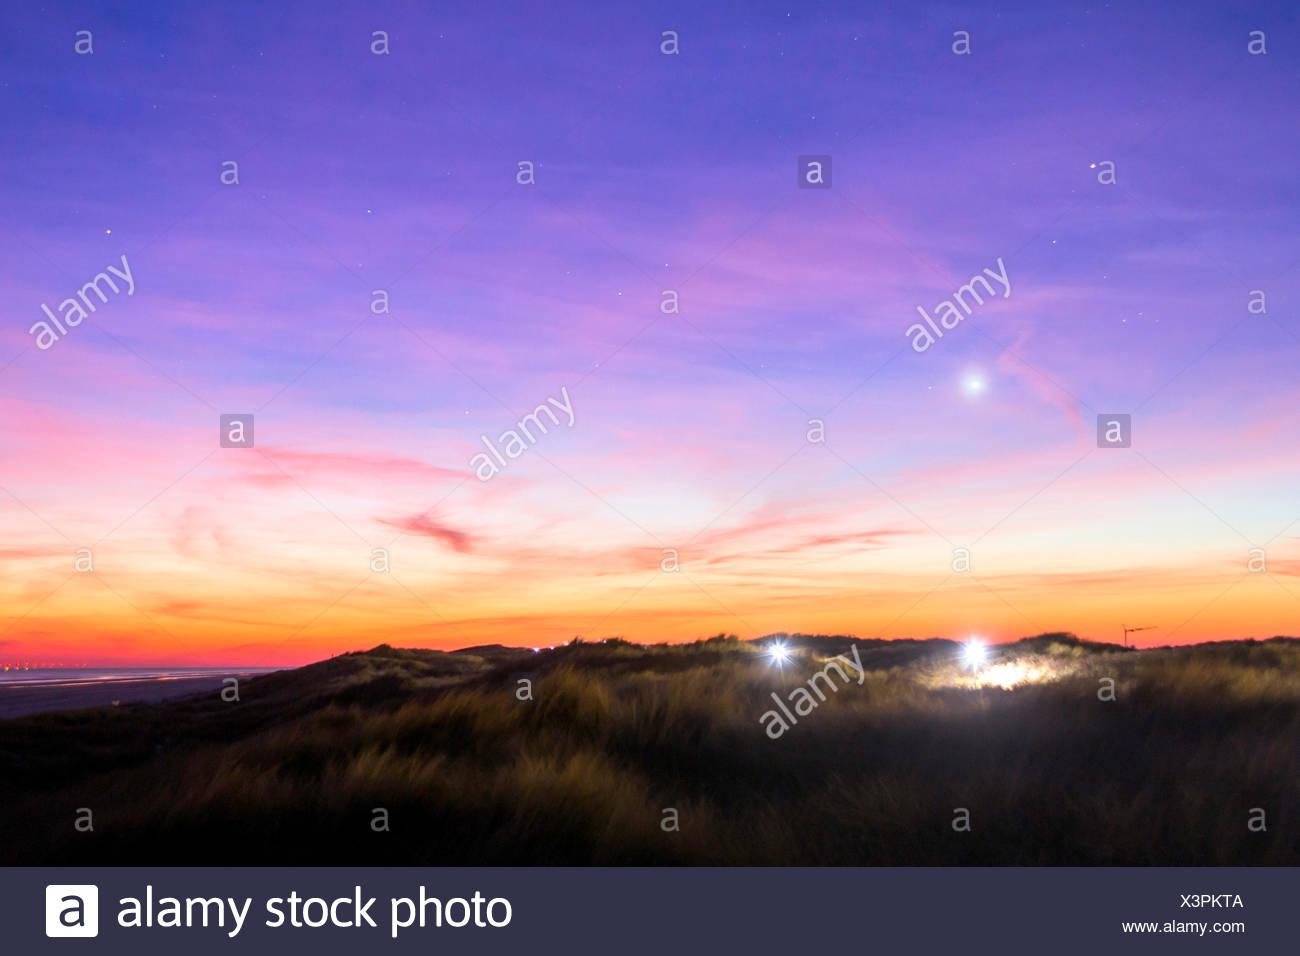 Pianeta Venere su isola Juist, Germania, Bassa Sassonia, Juist Immagini Stock